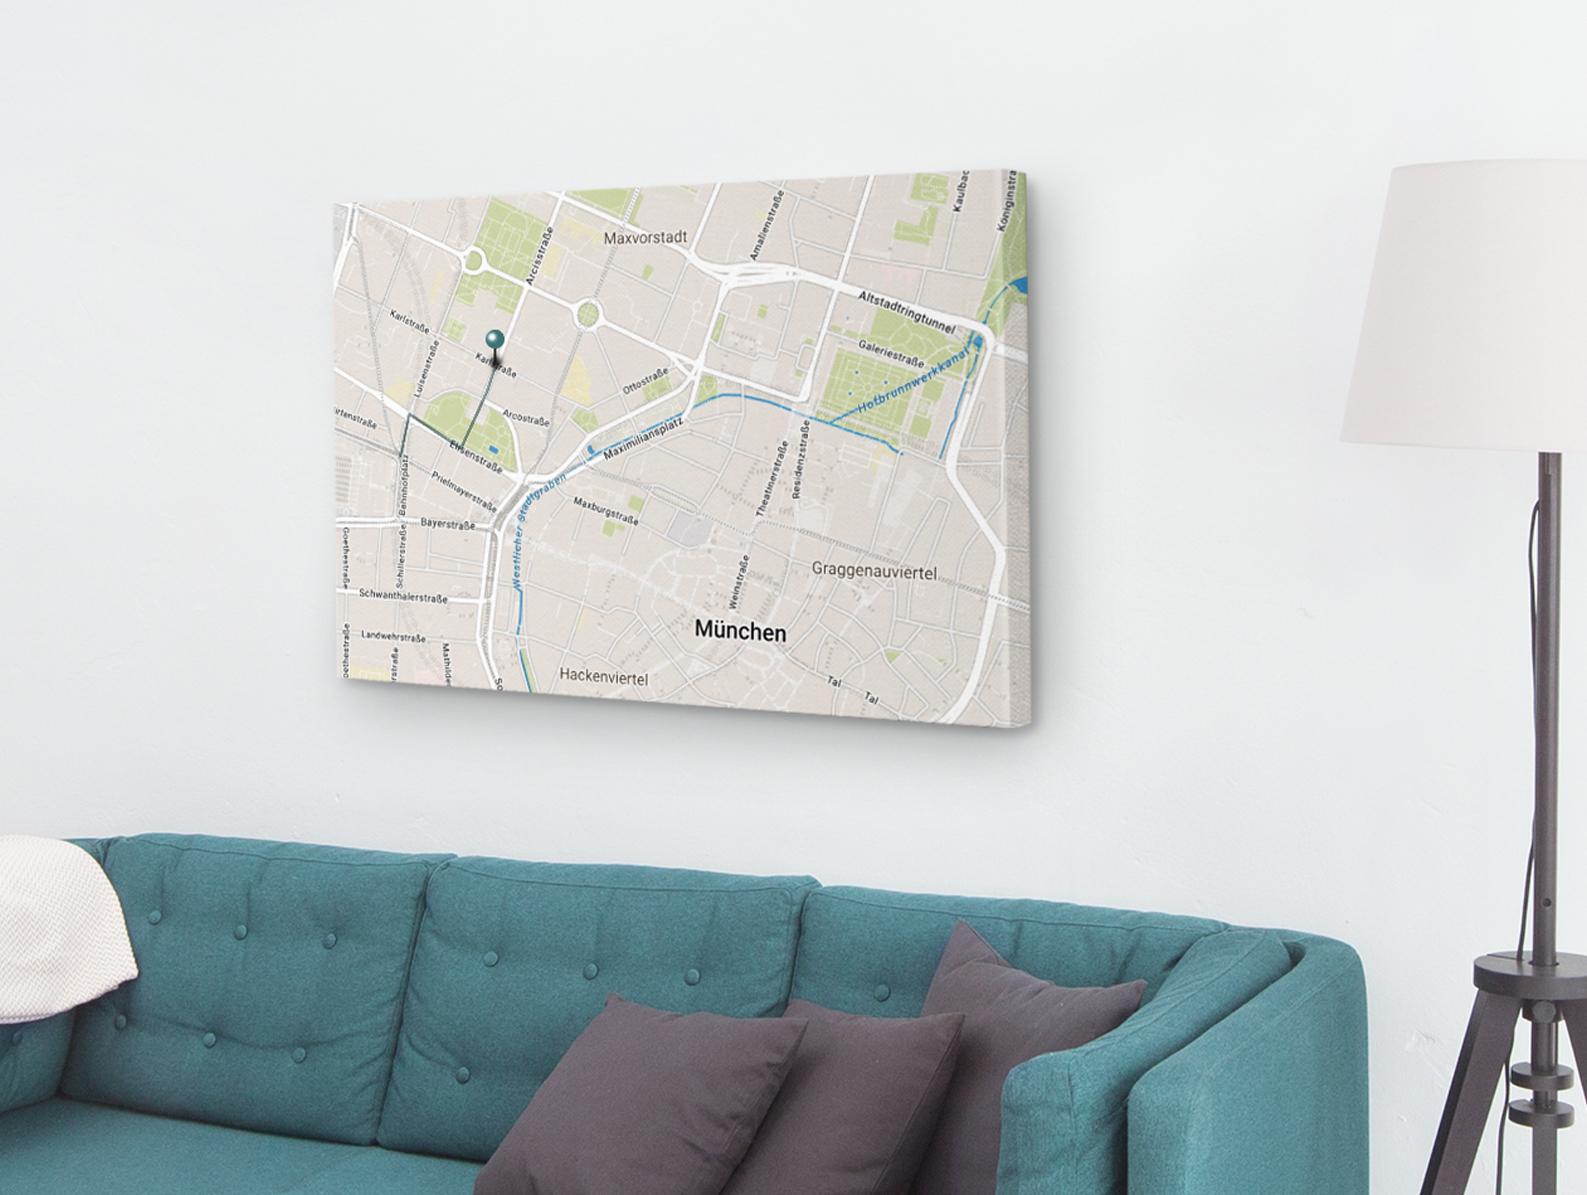 karten drucken lassen mit openstreetmap. Black Bedroom Furniture Sets. Home Design Ideas